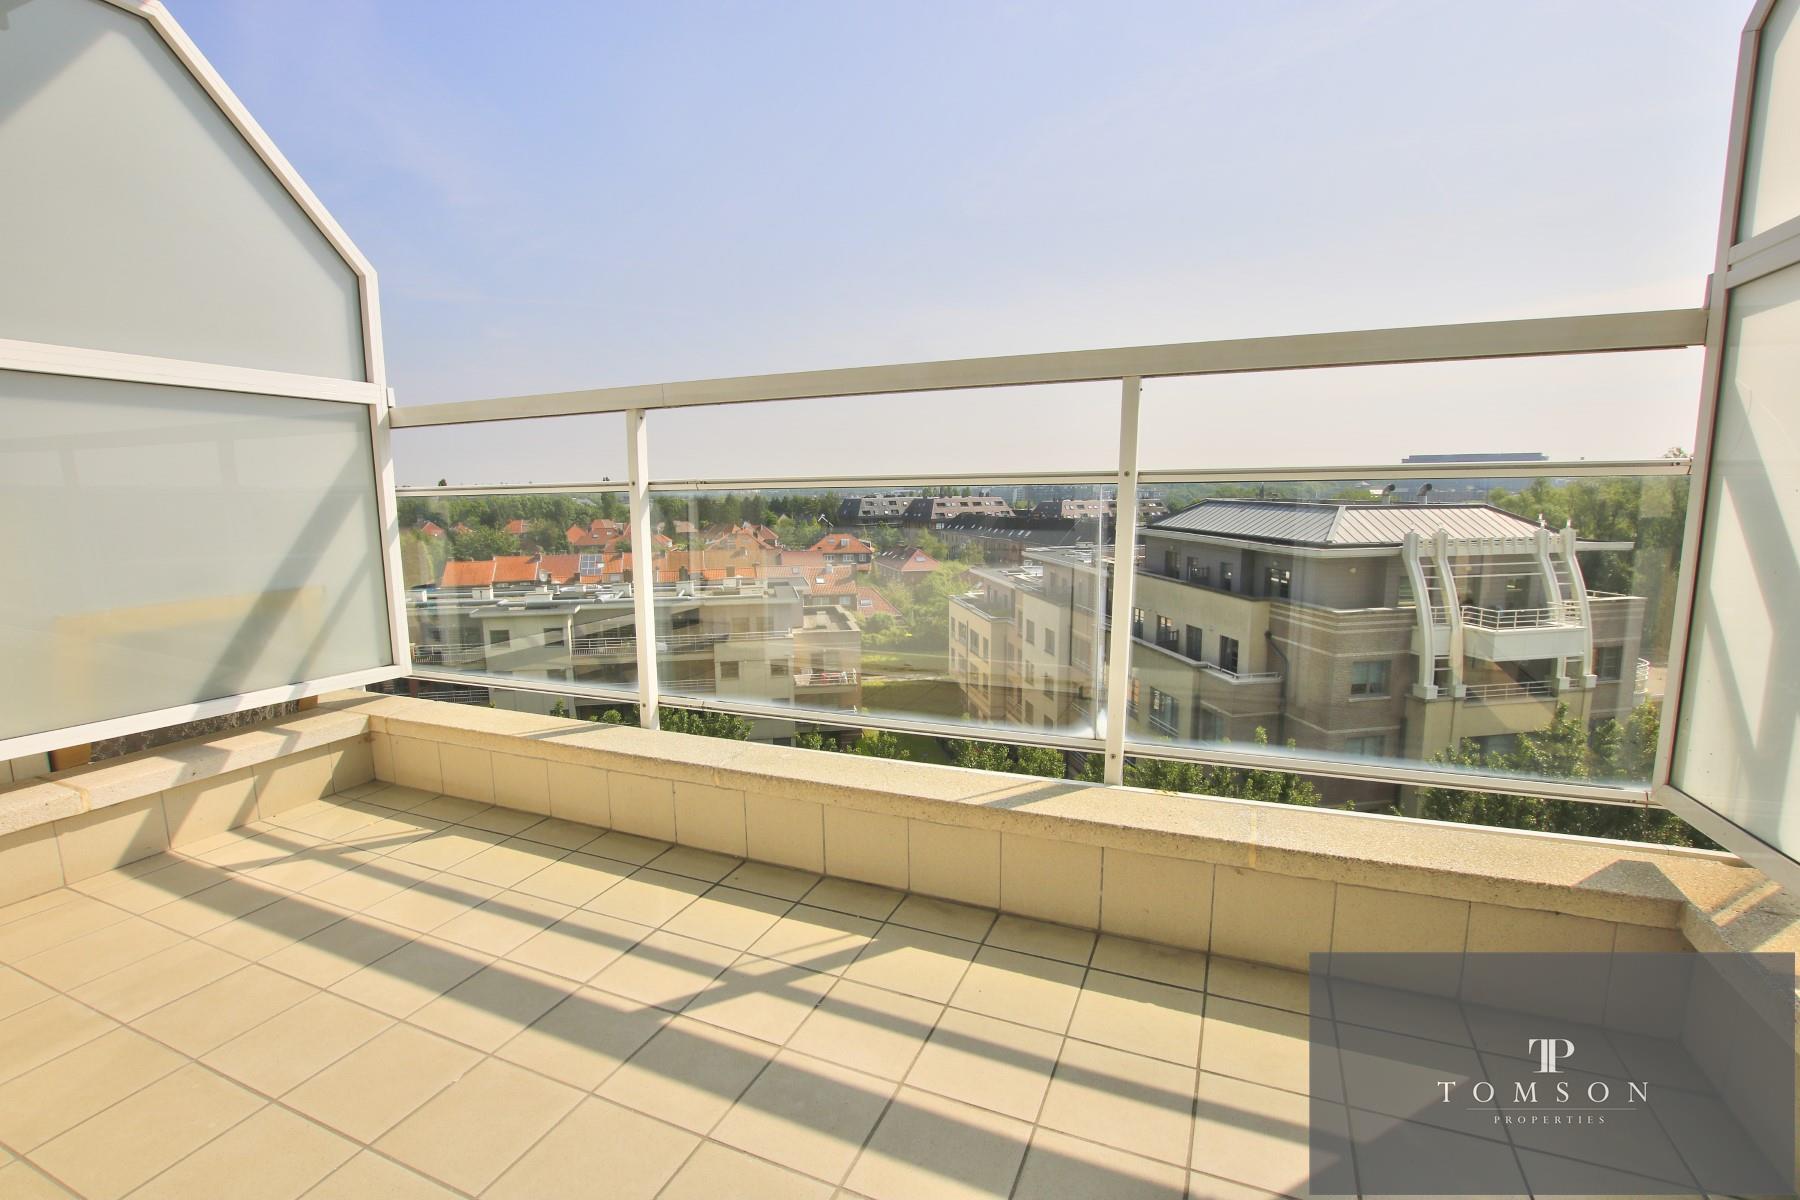 Appartement - Woluwe-Saint-Lambert - #4530510-13